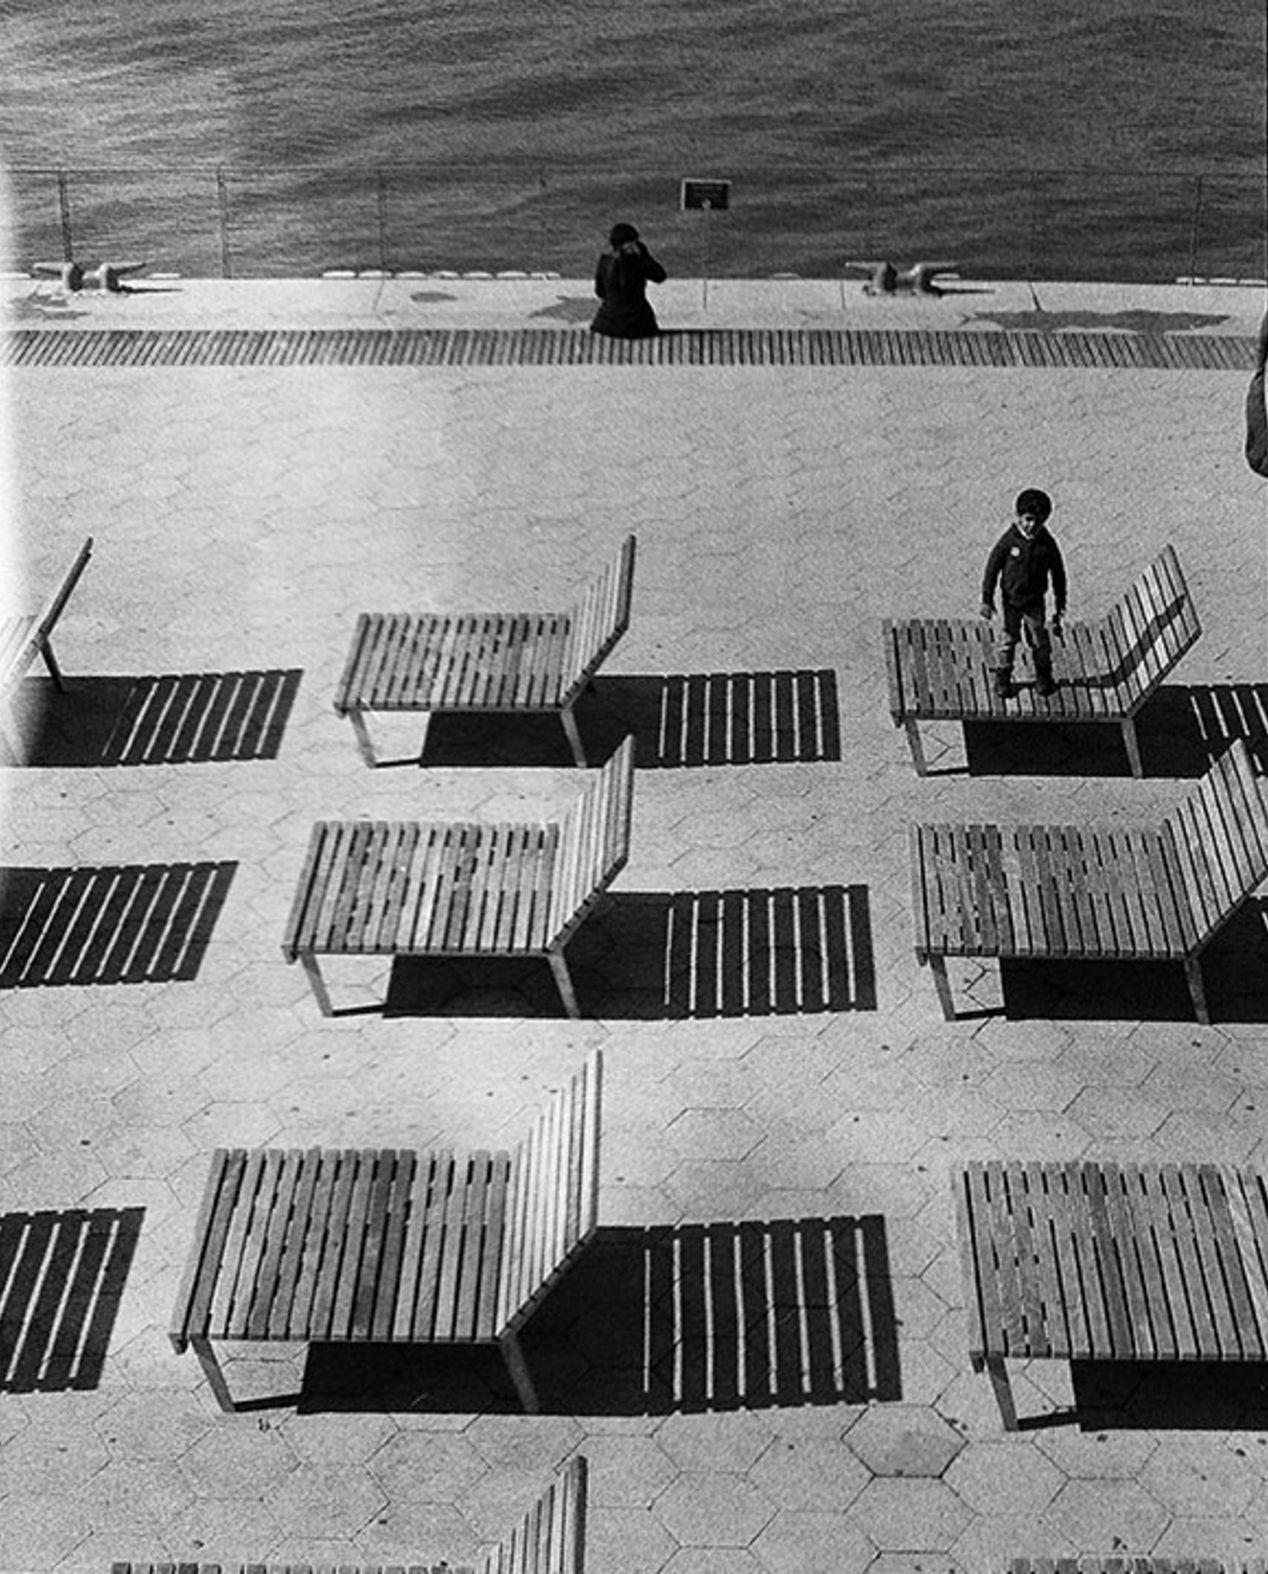 Benches. Seaside. New York. Olympus Pen FT, Kodak Tri-X.